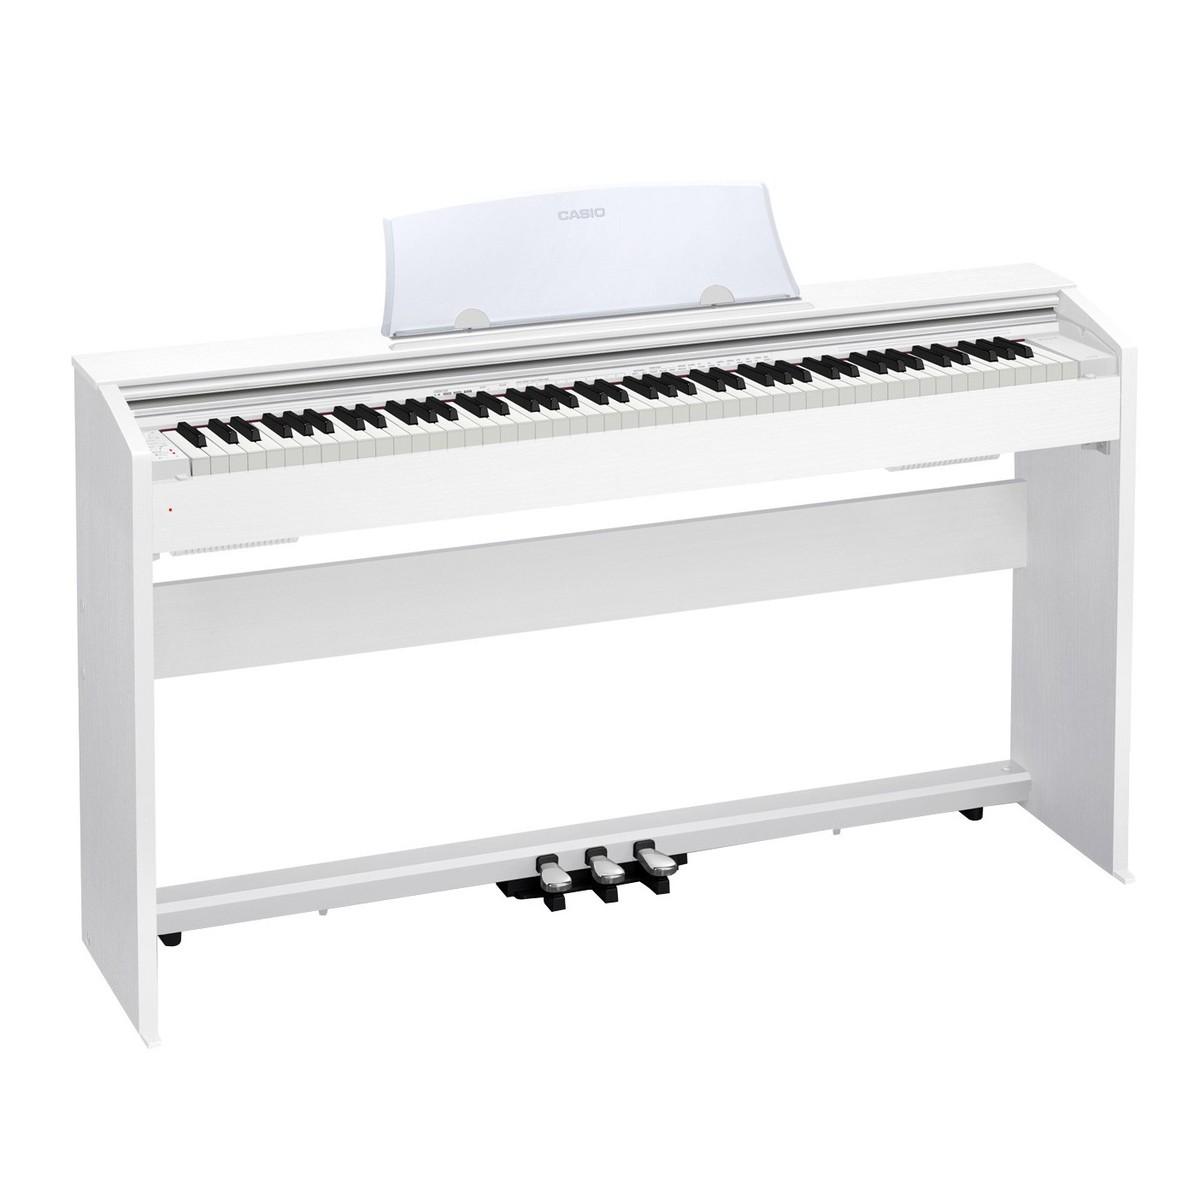 88 Key Casio PX-770 White PRIVIA Electronic Keyboard Piano Organ Tri sensor Scaled Hammer Action Keyboard II Simulated ebony and ivory keys